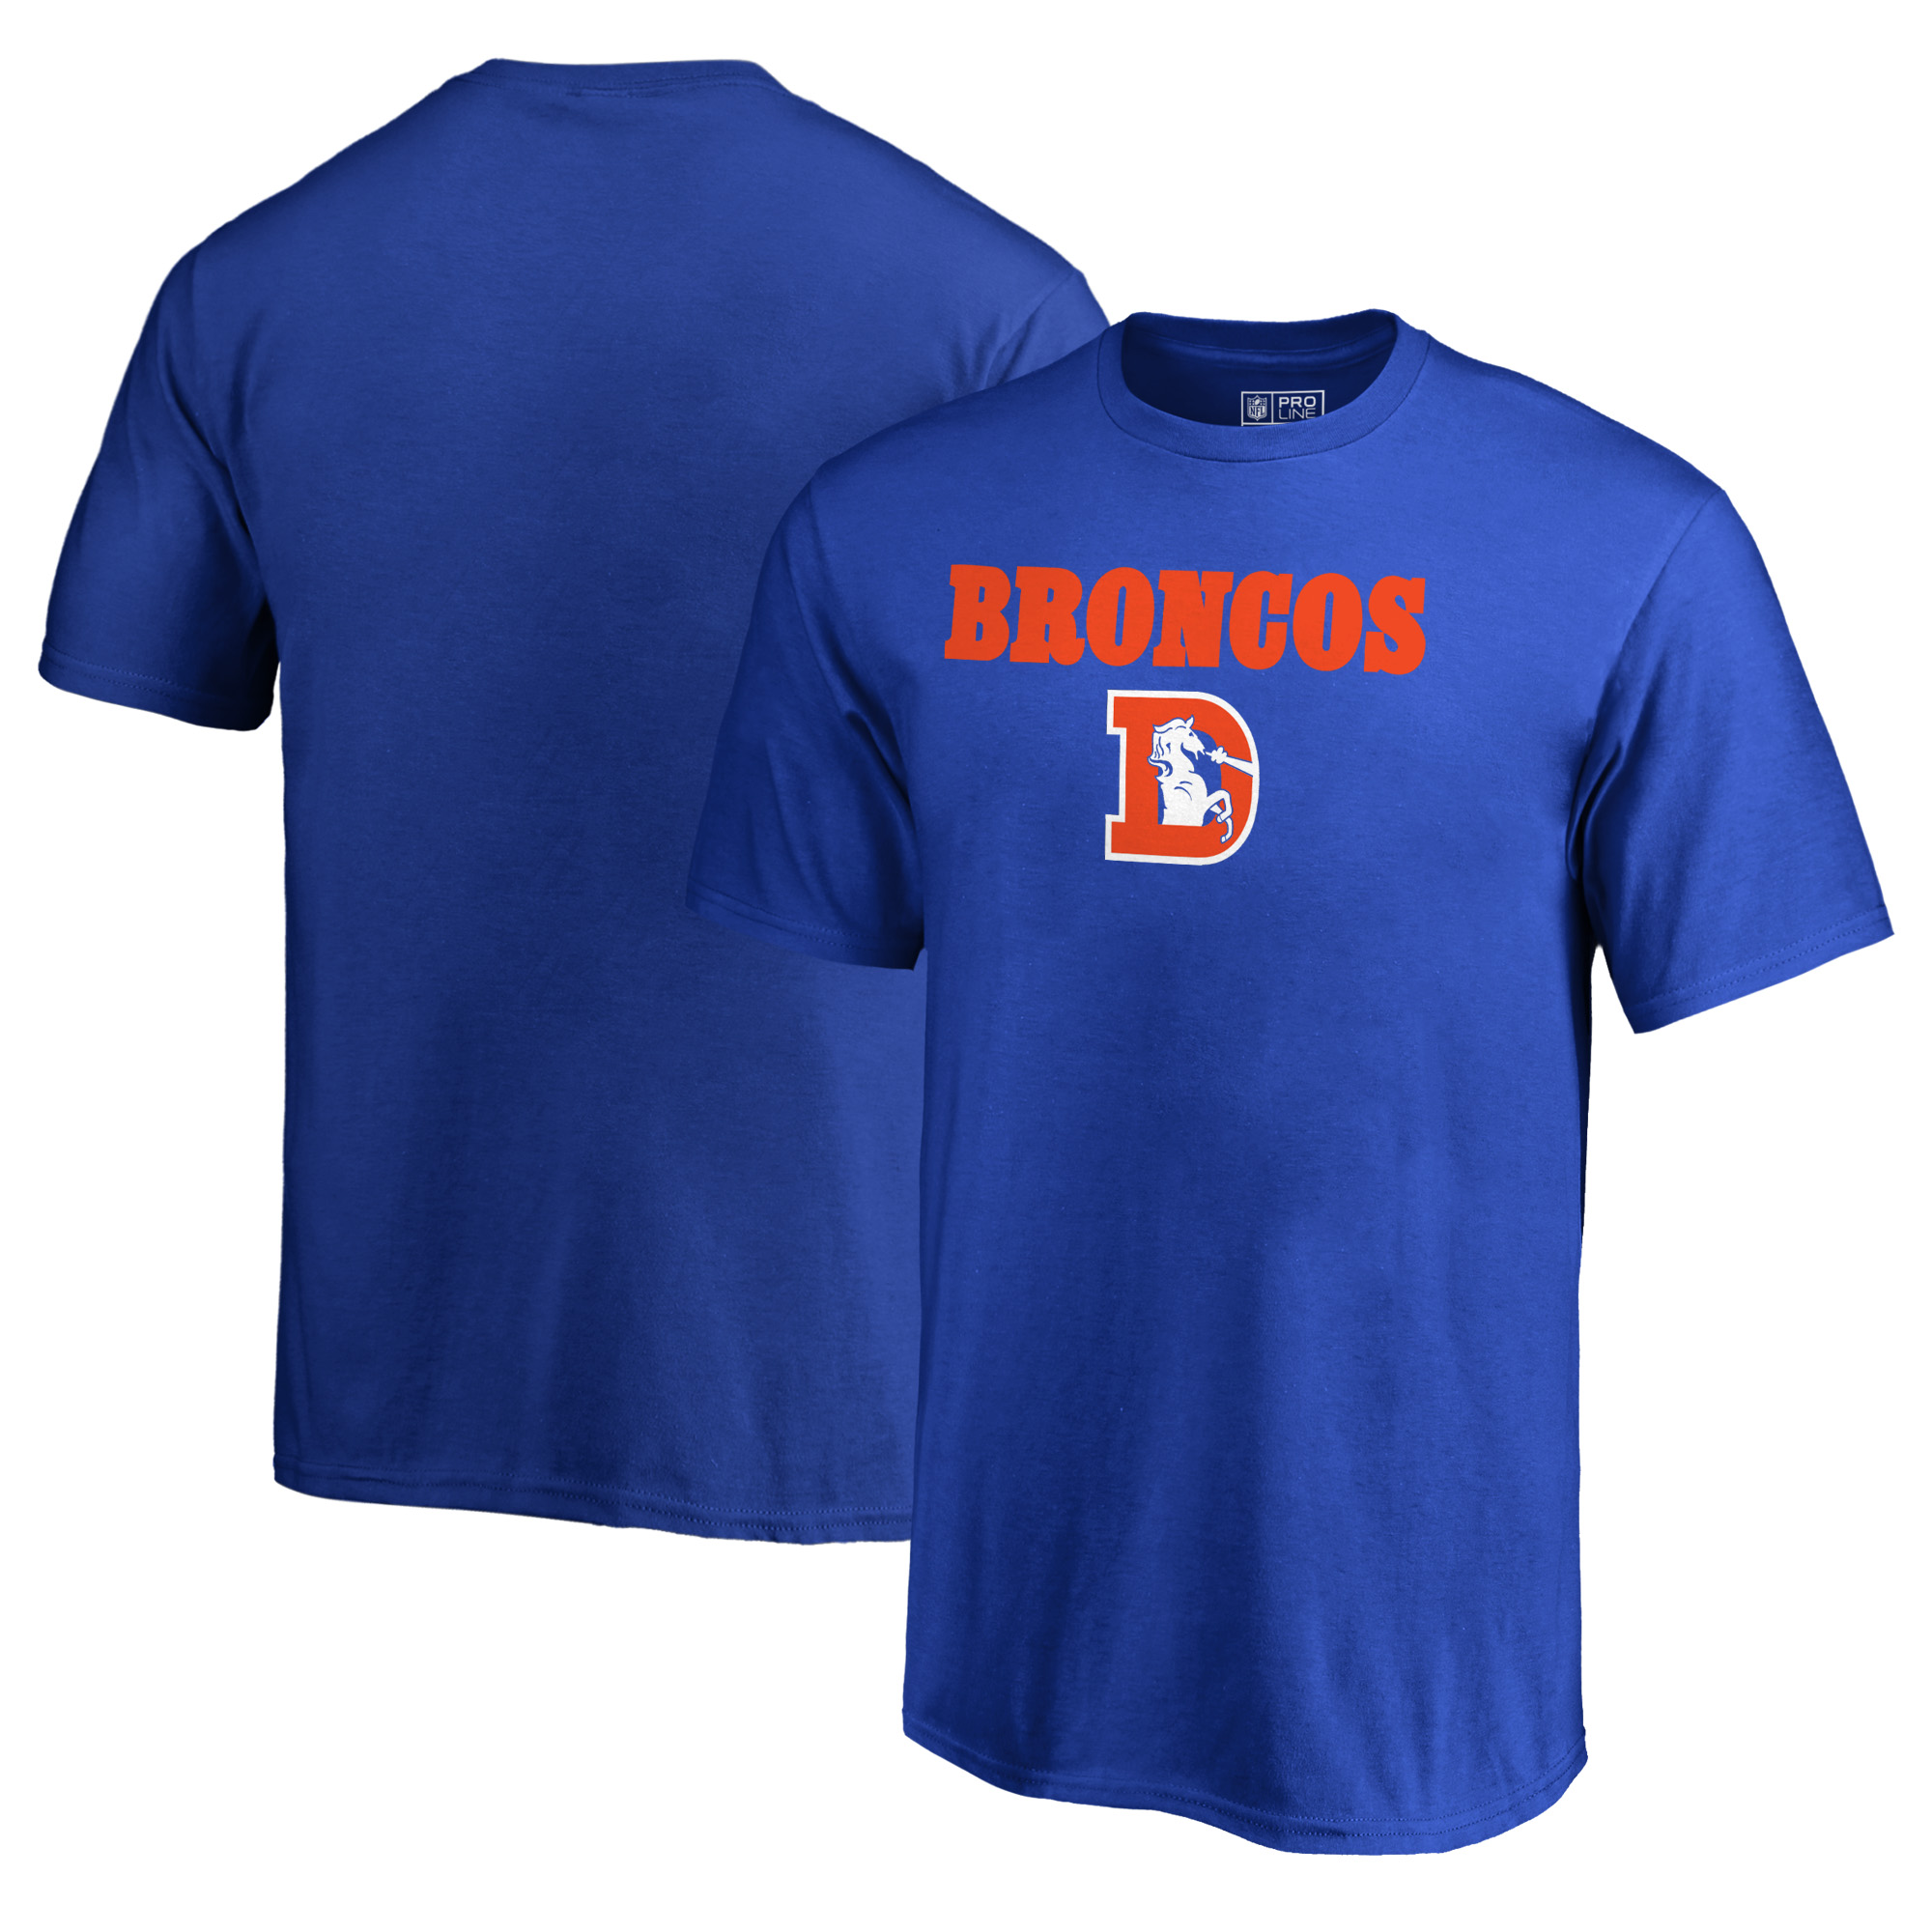 Denver Broncos NFL Pro Line by Fanatics Branded Youth Vintage Team Lockup T-Shirt - Royal